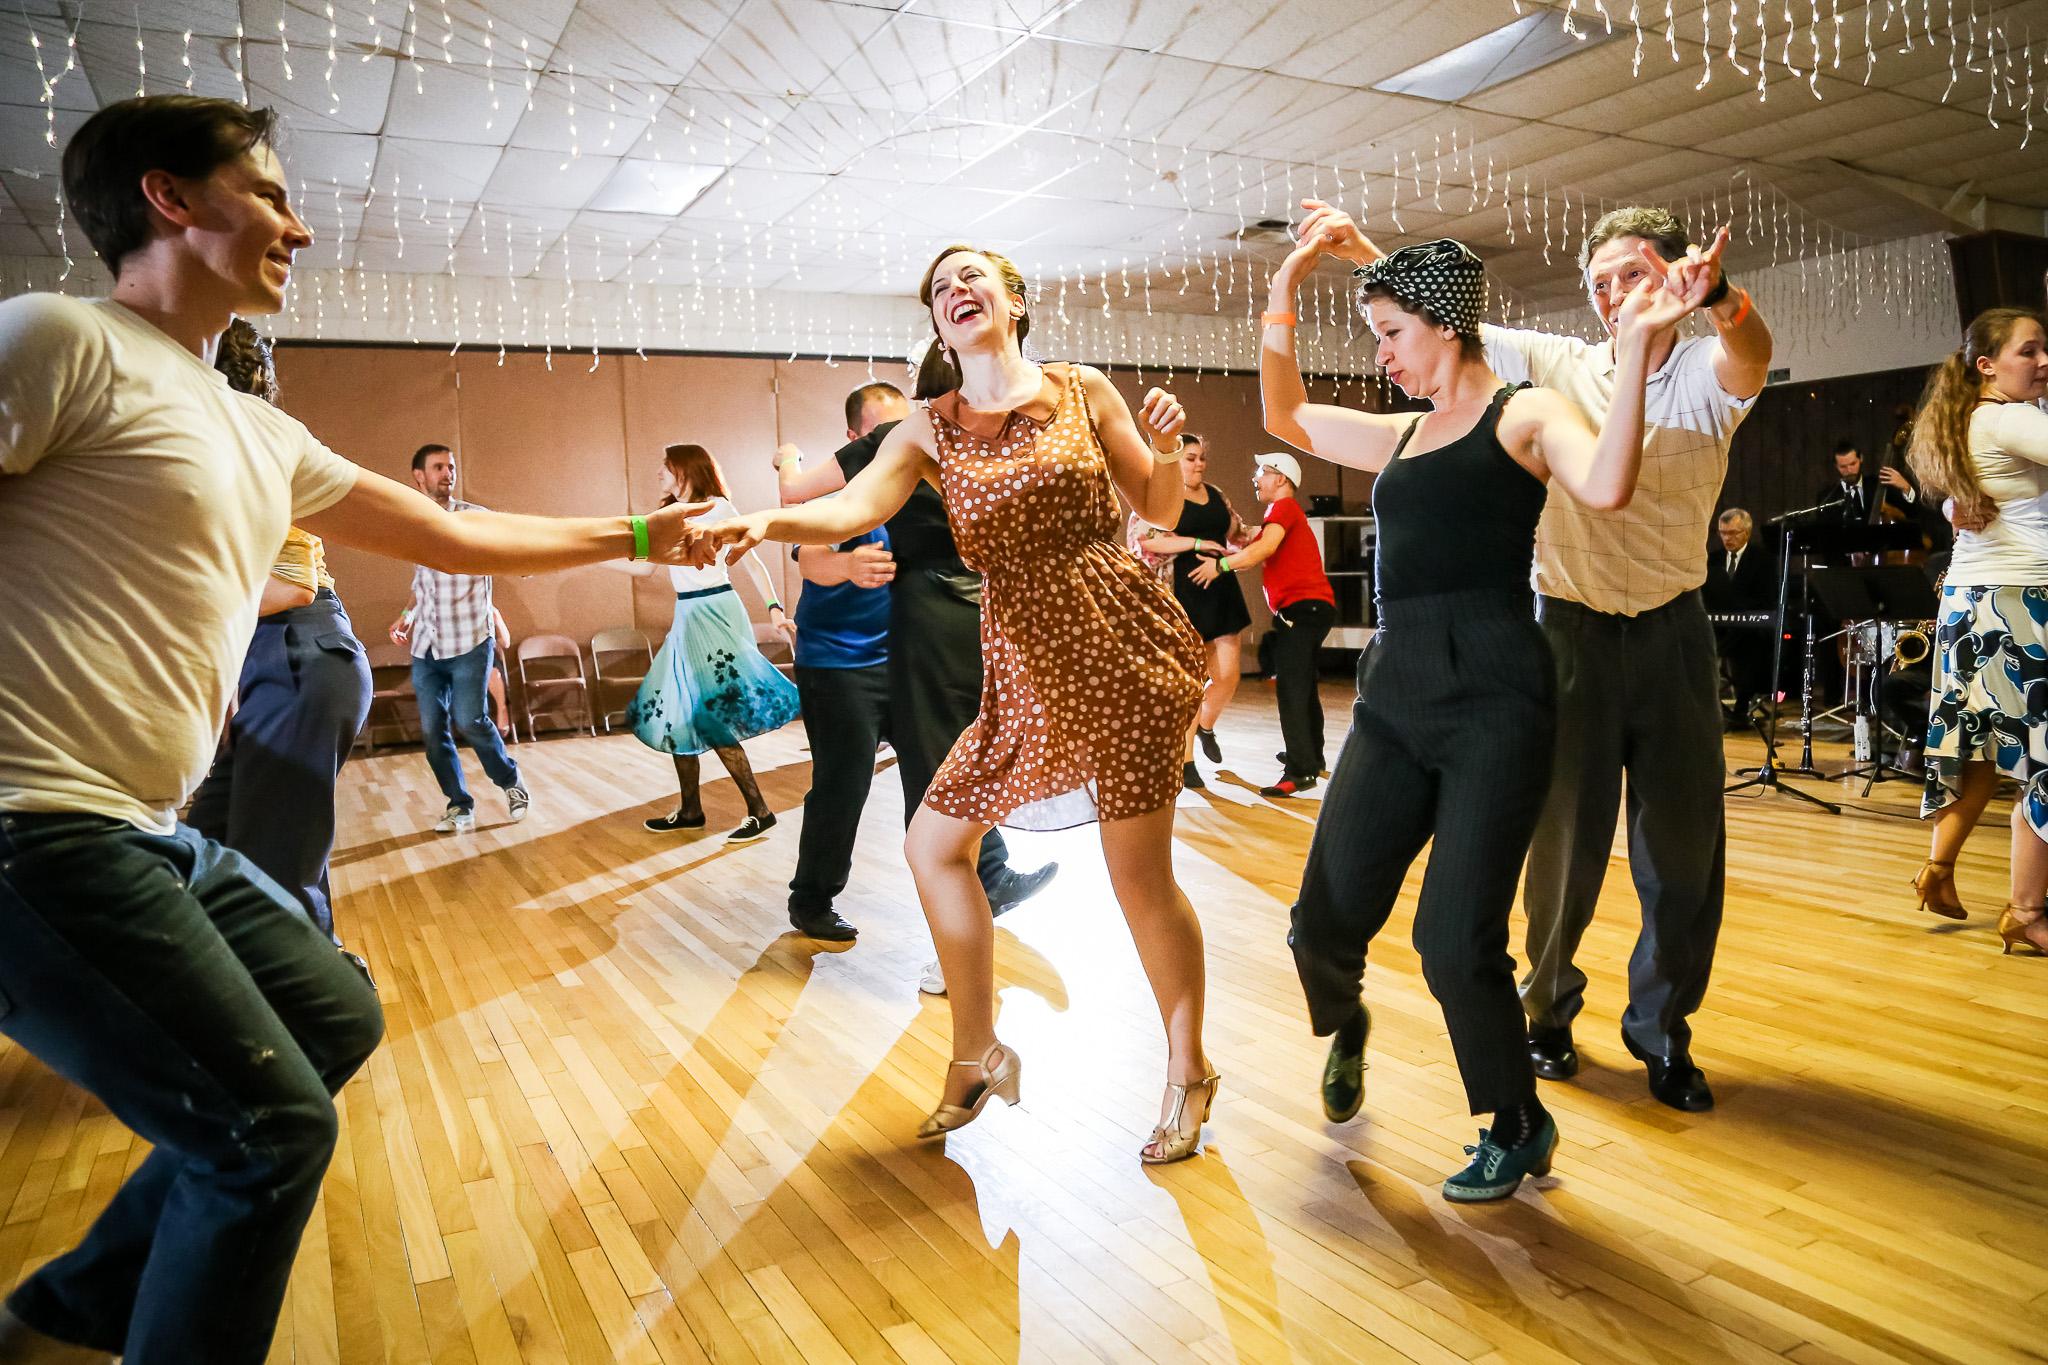 dance-lindy-hop-albuquerque--2.jpg